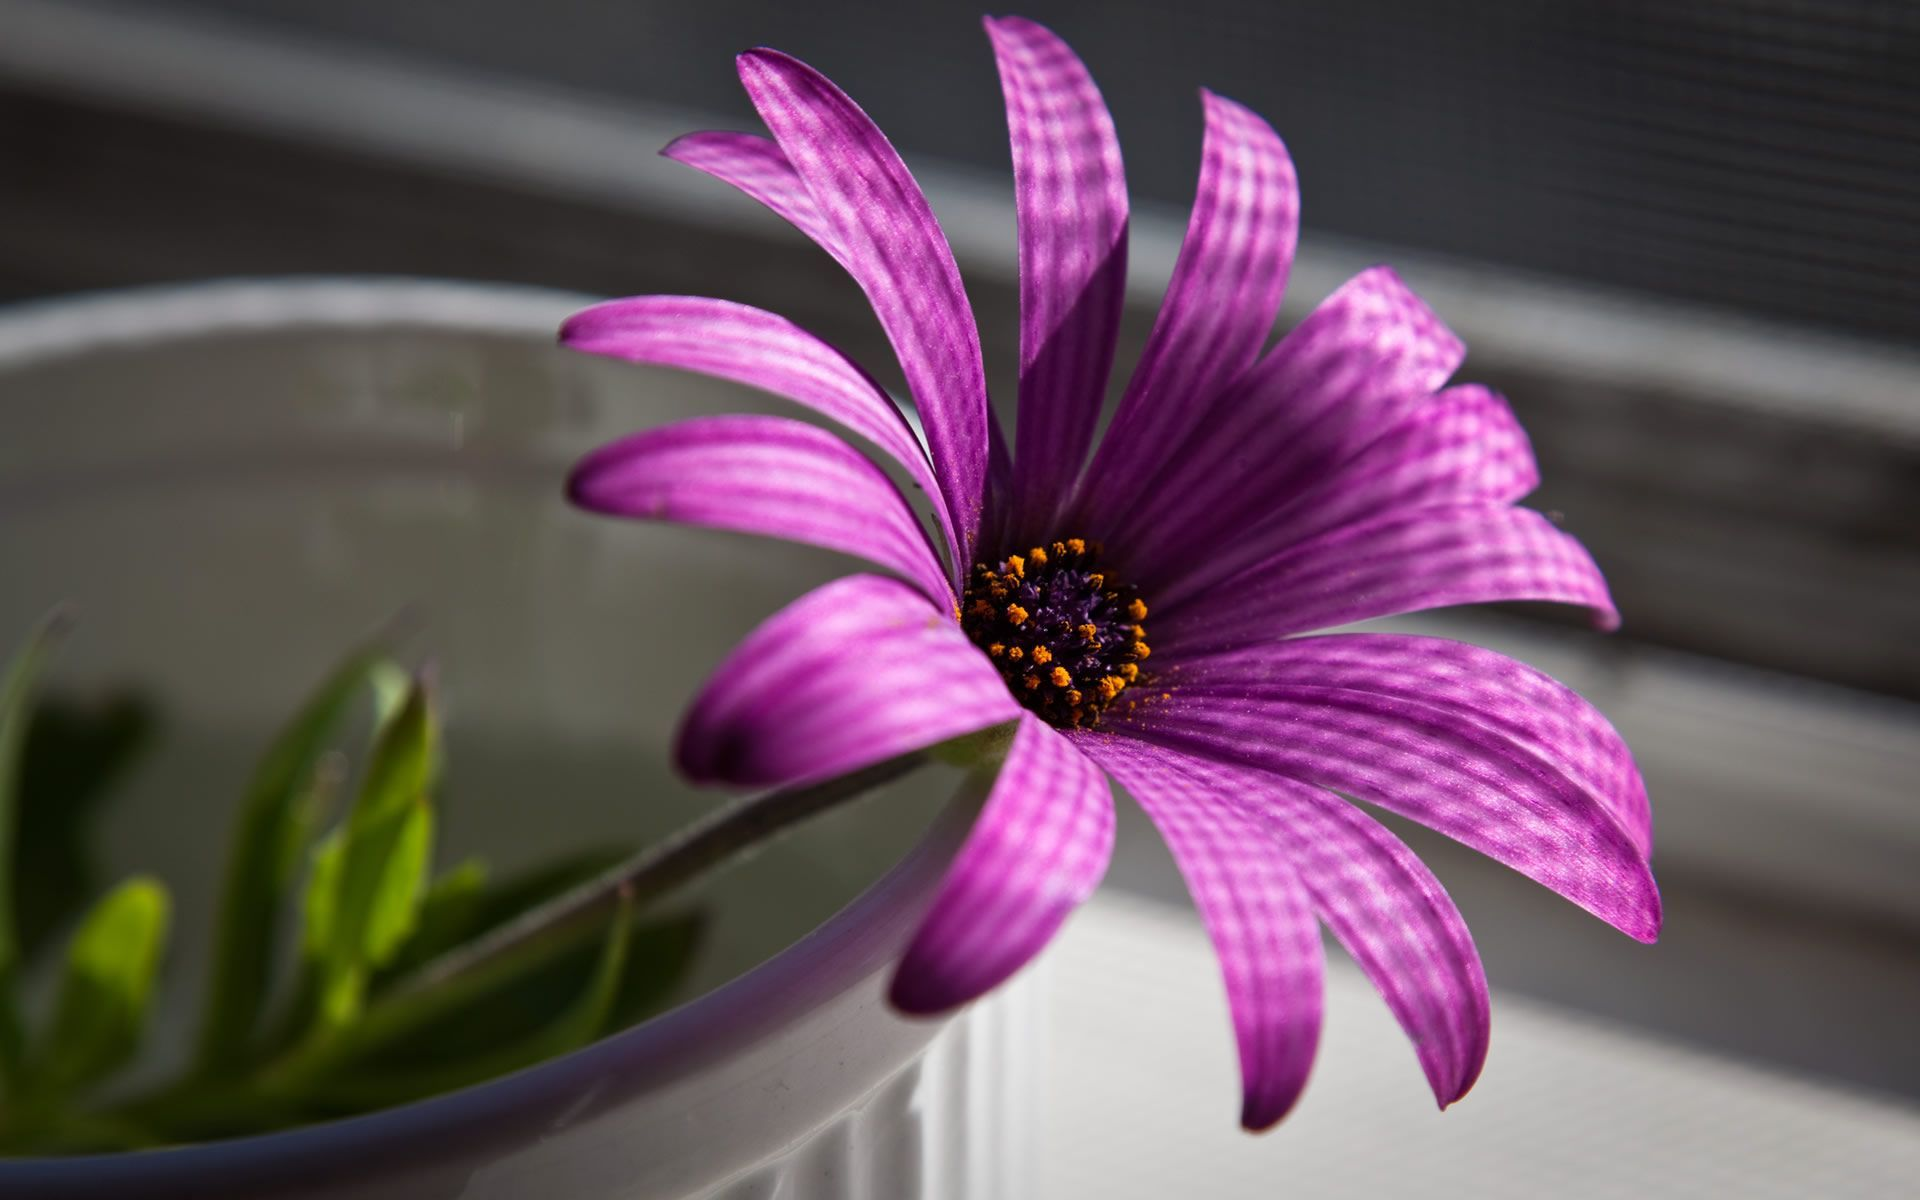 Purple Flower Desktop Wallpapers Top Free Purple Flower Desktop Backgrounds Wallpaperaccess